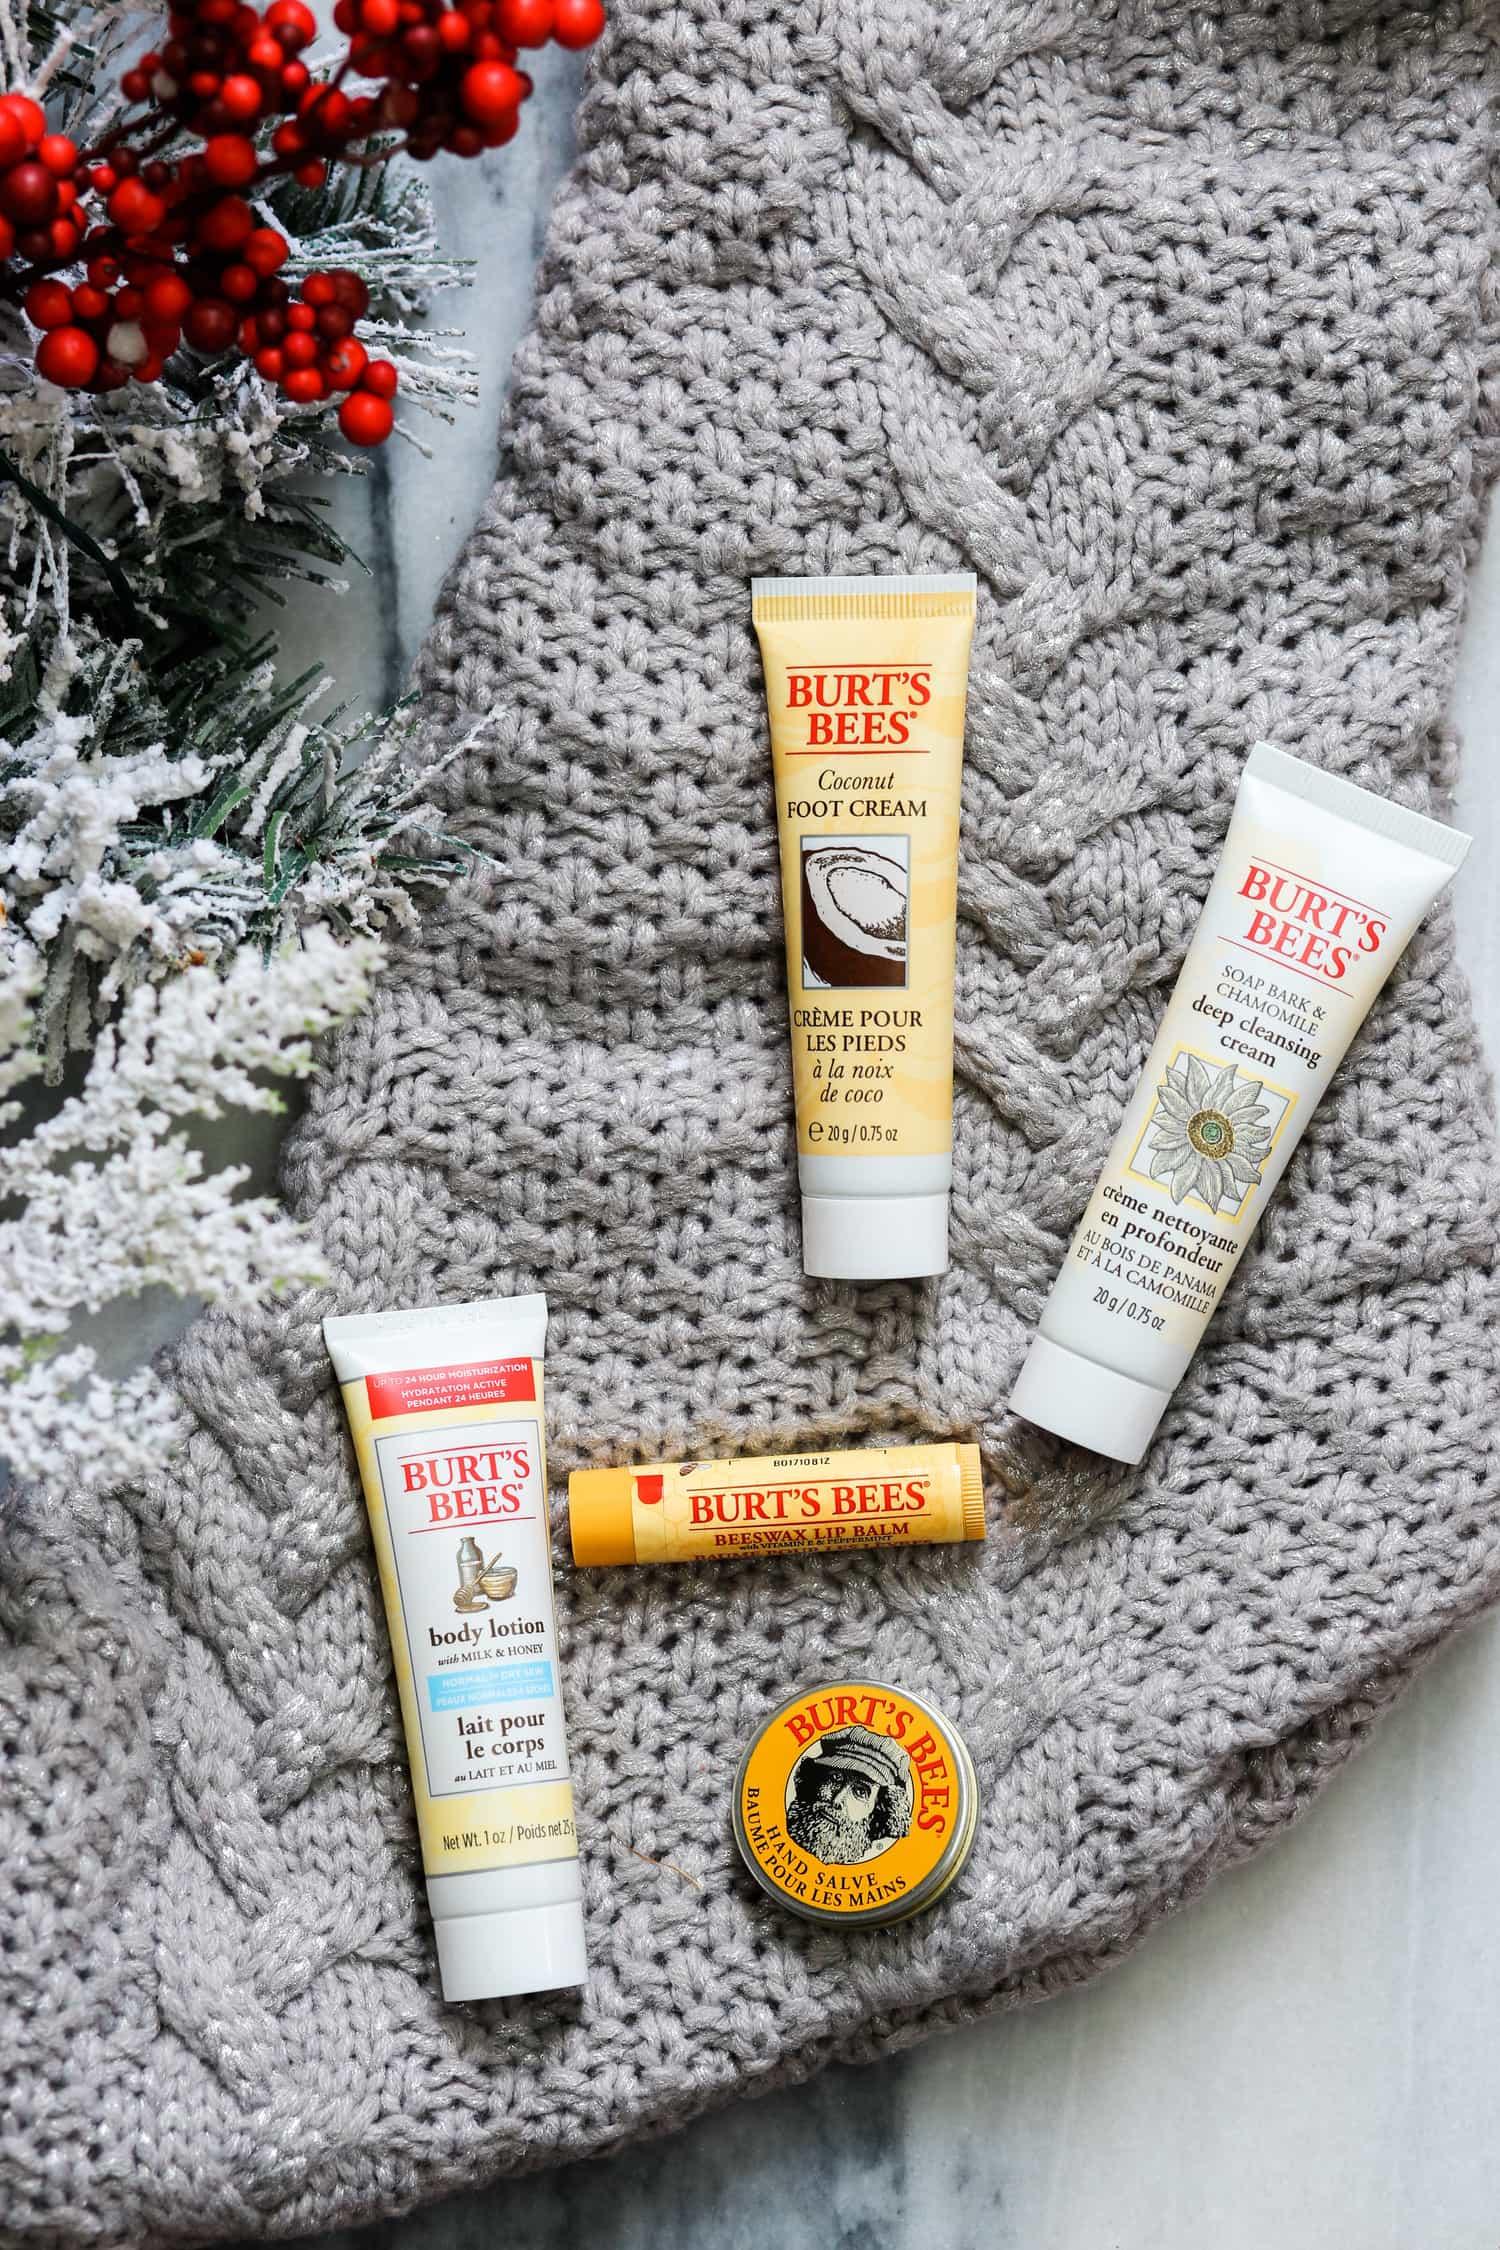 Burt's Bees stocking stuffer ideas cute Christmas gift ideas Christmas tree ornaments Ashley Brooke Nicholas blogger